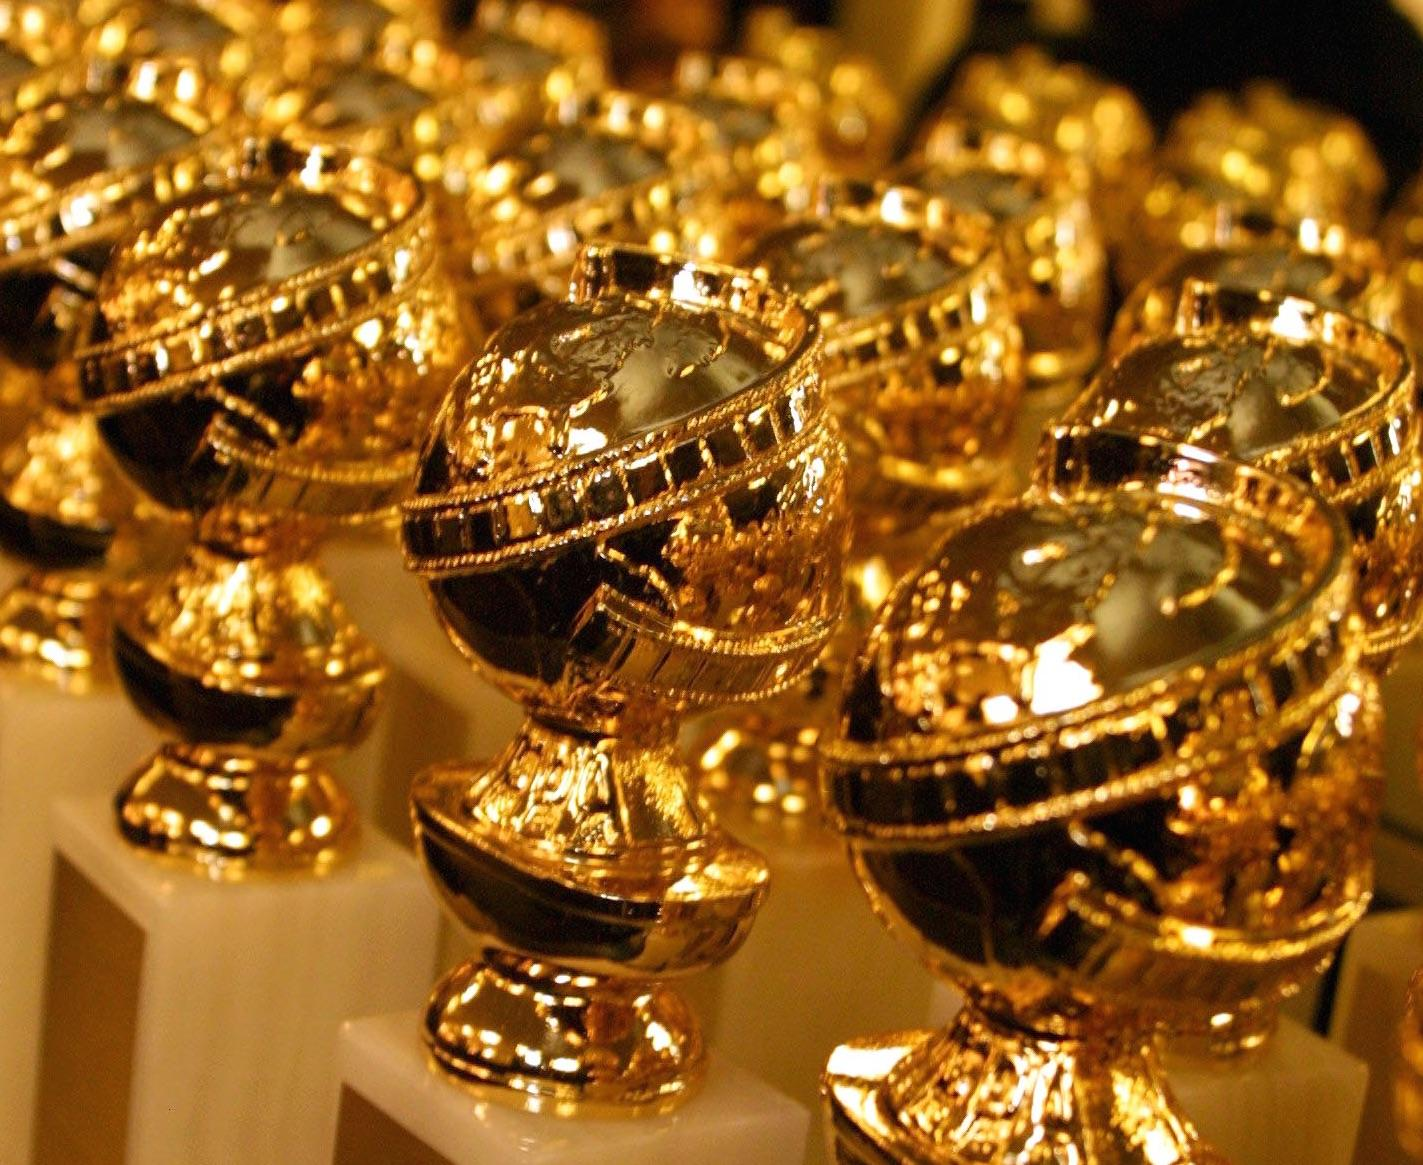 Golden Globes Live Stream